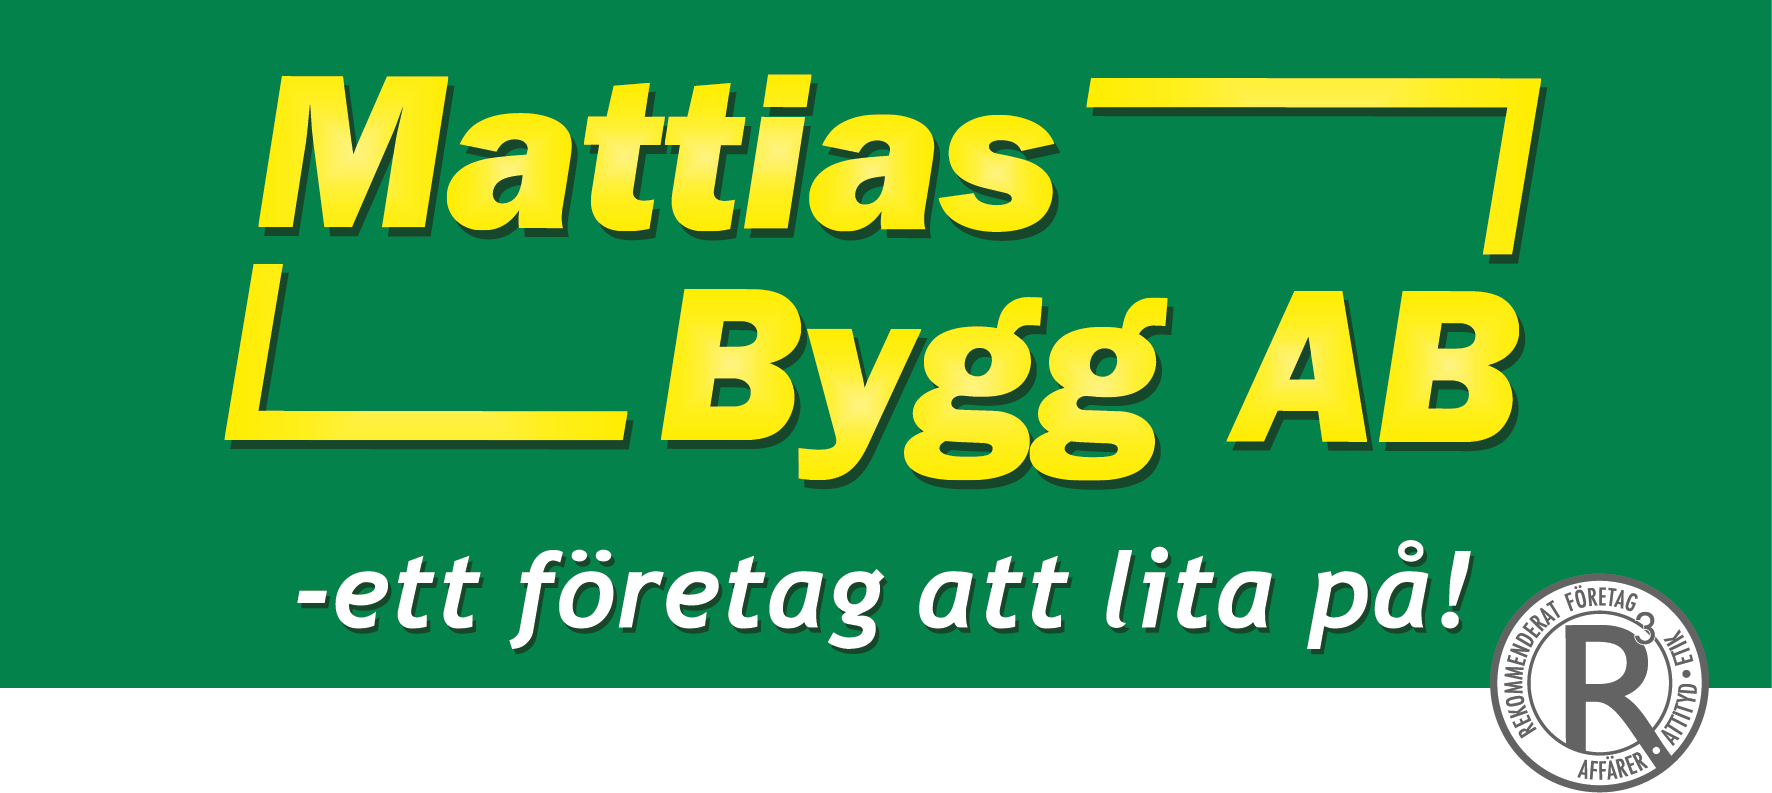 Mattias Bygg